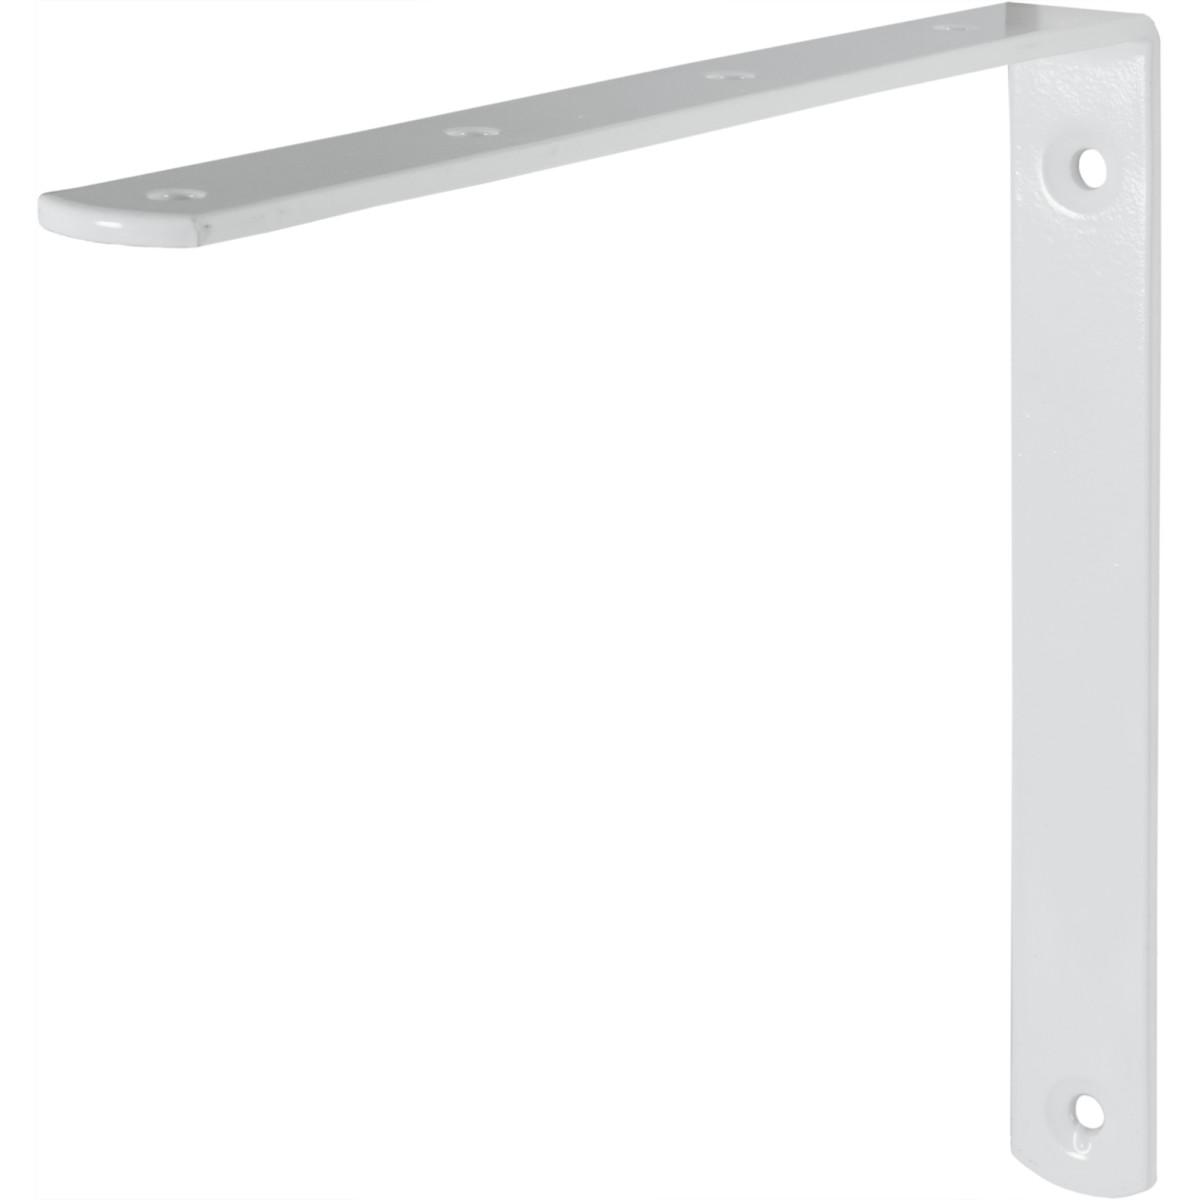 Кронштейн Angle 3 150x175 мм цвет белый